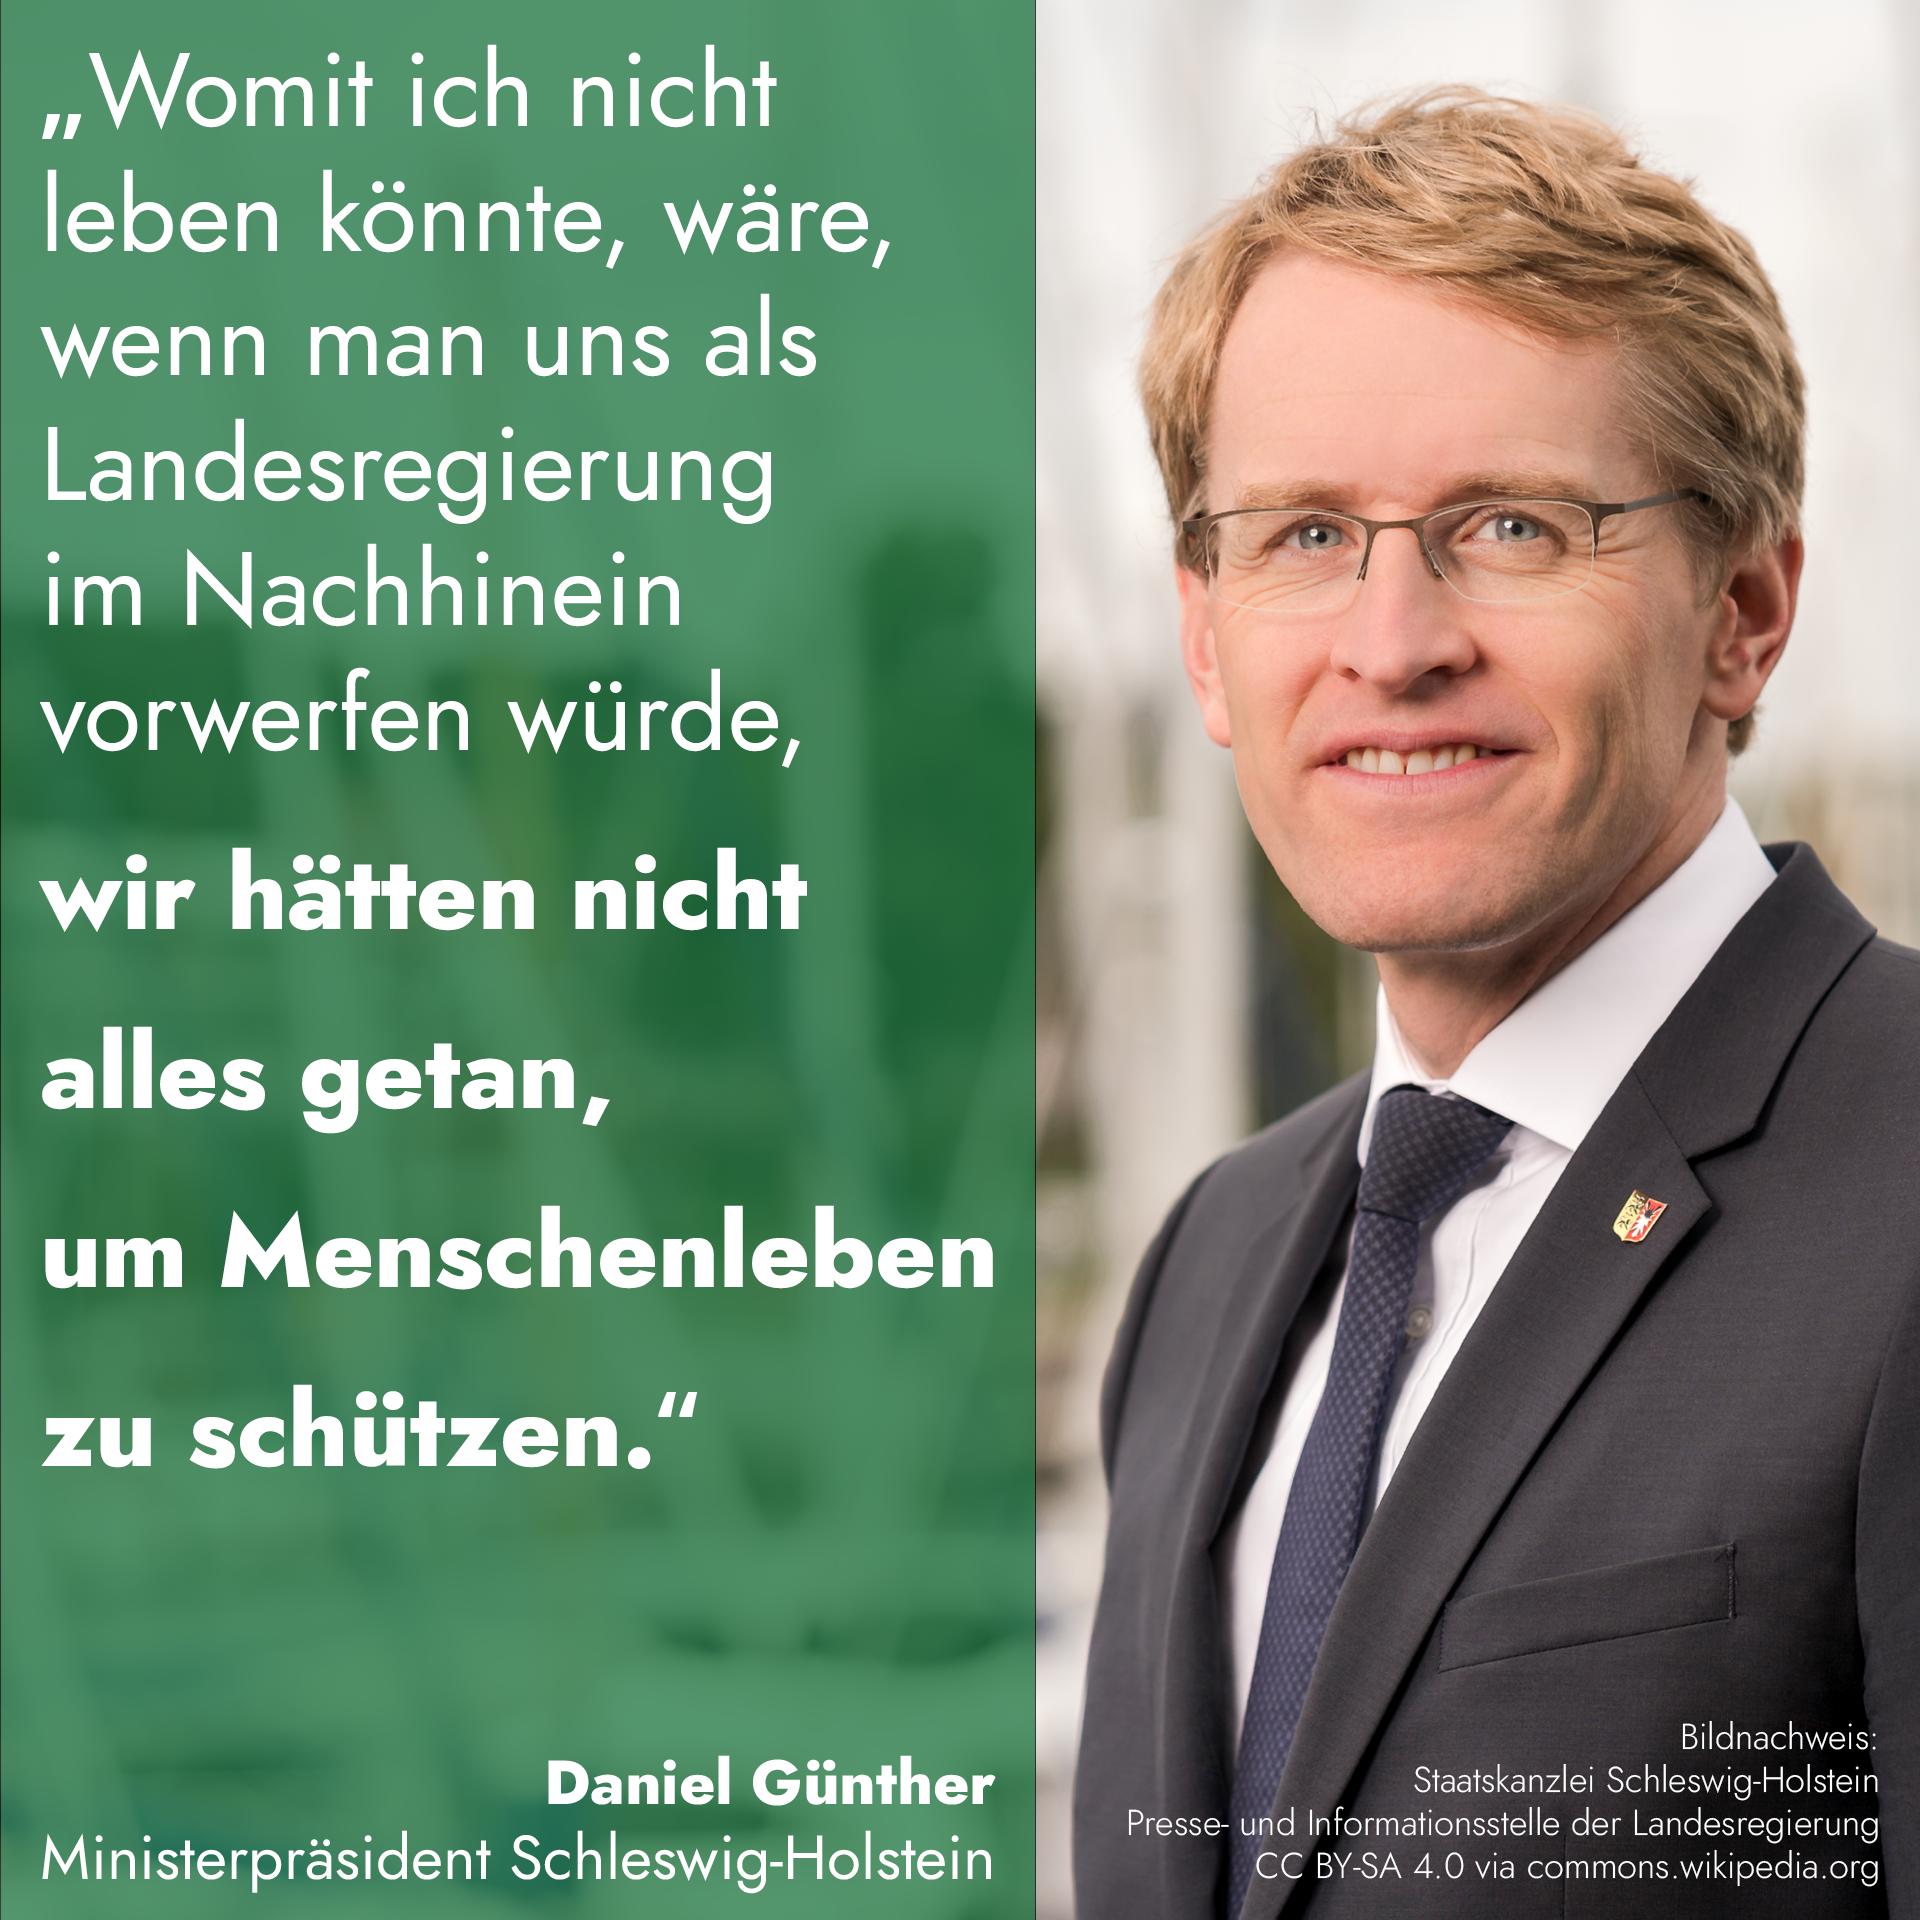 Sharepic: Daniel Günther